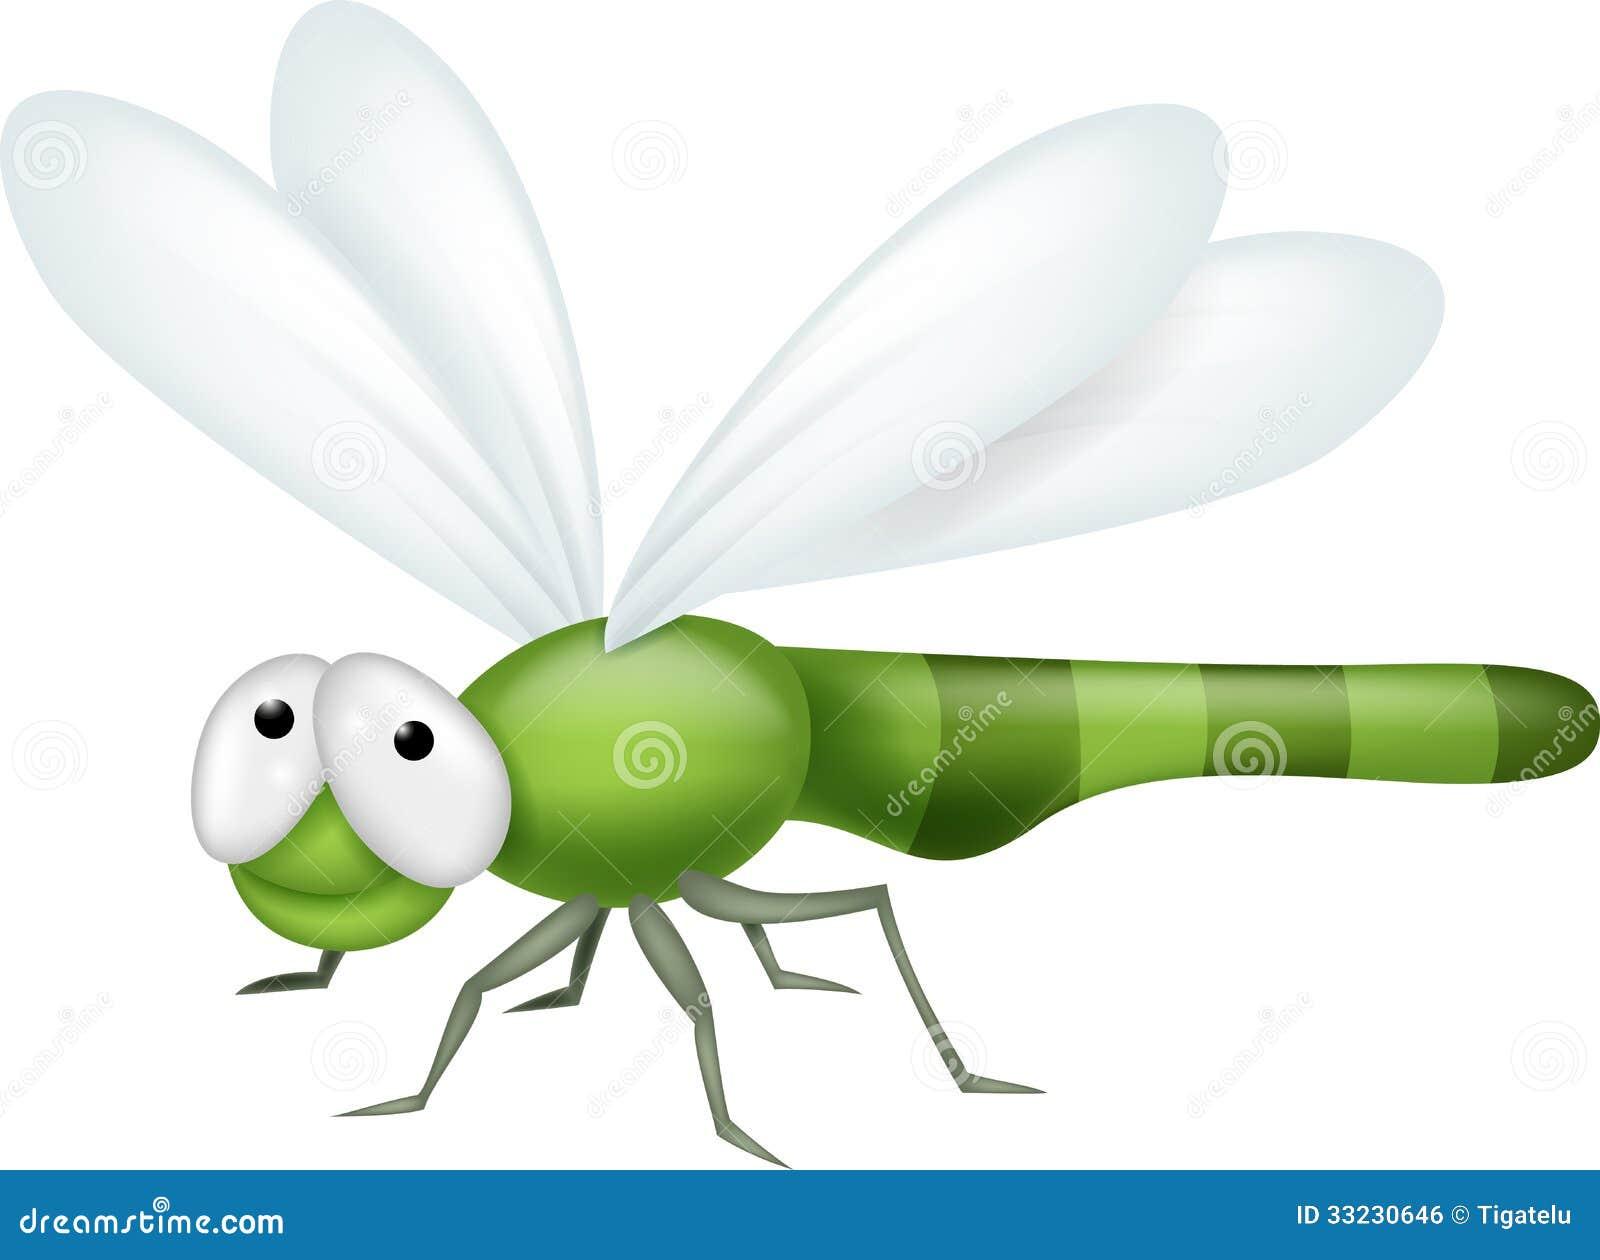 Dragonfly Cartoon Royalty Free Stock Image - Image: 33230646